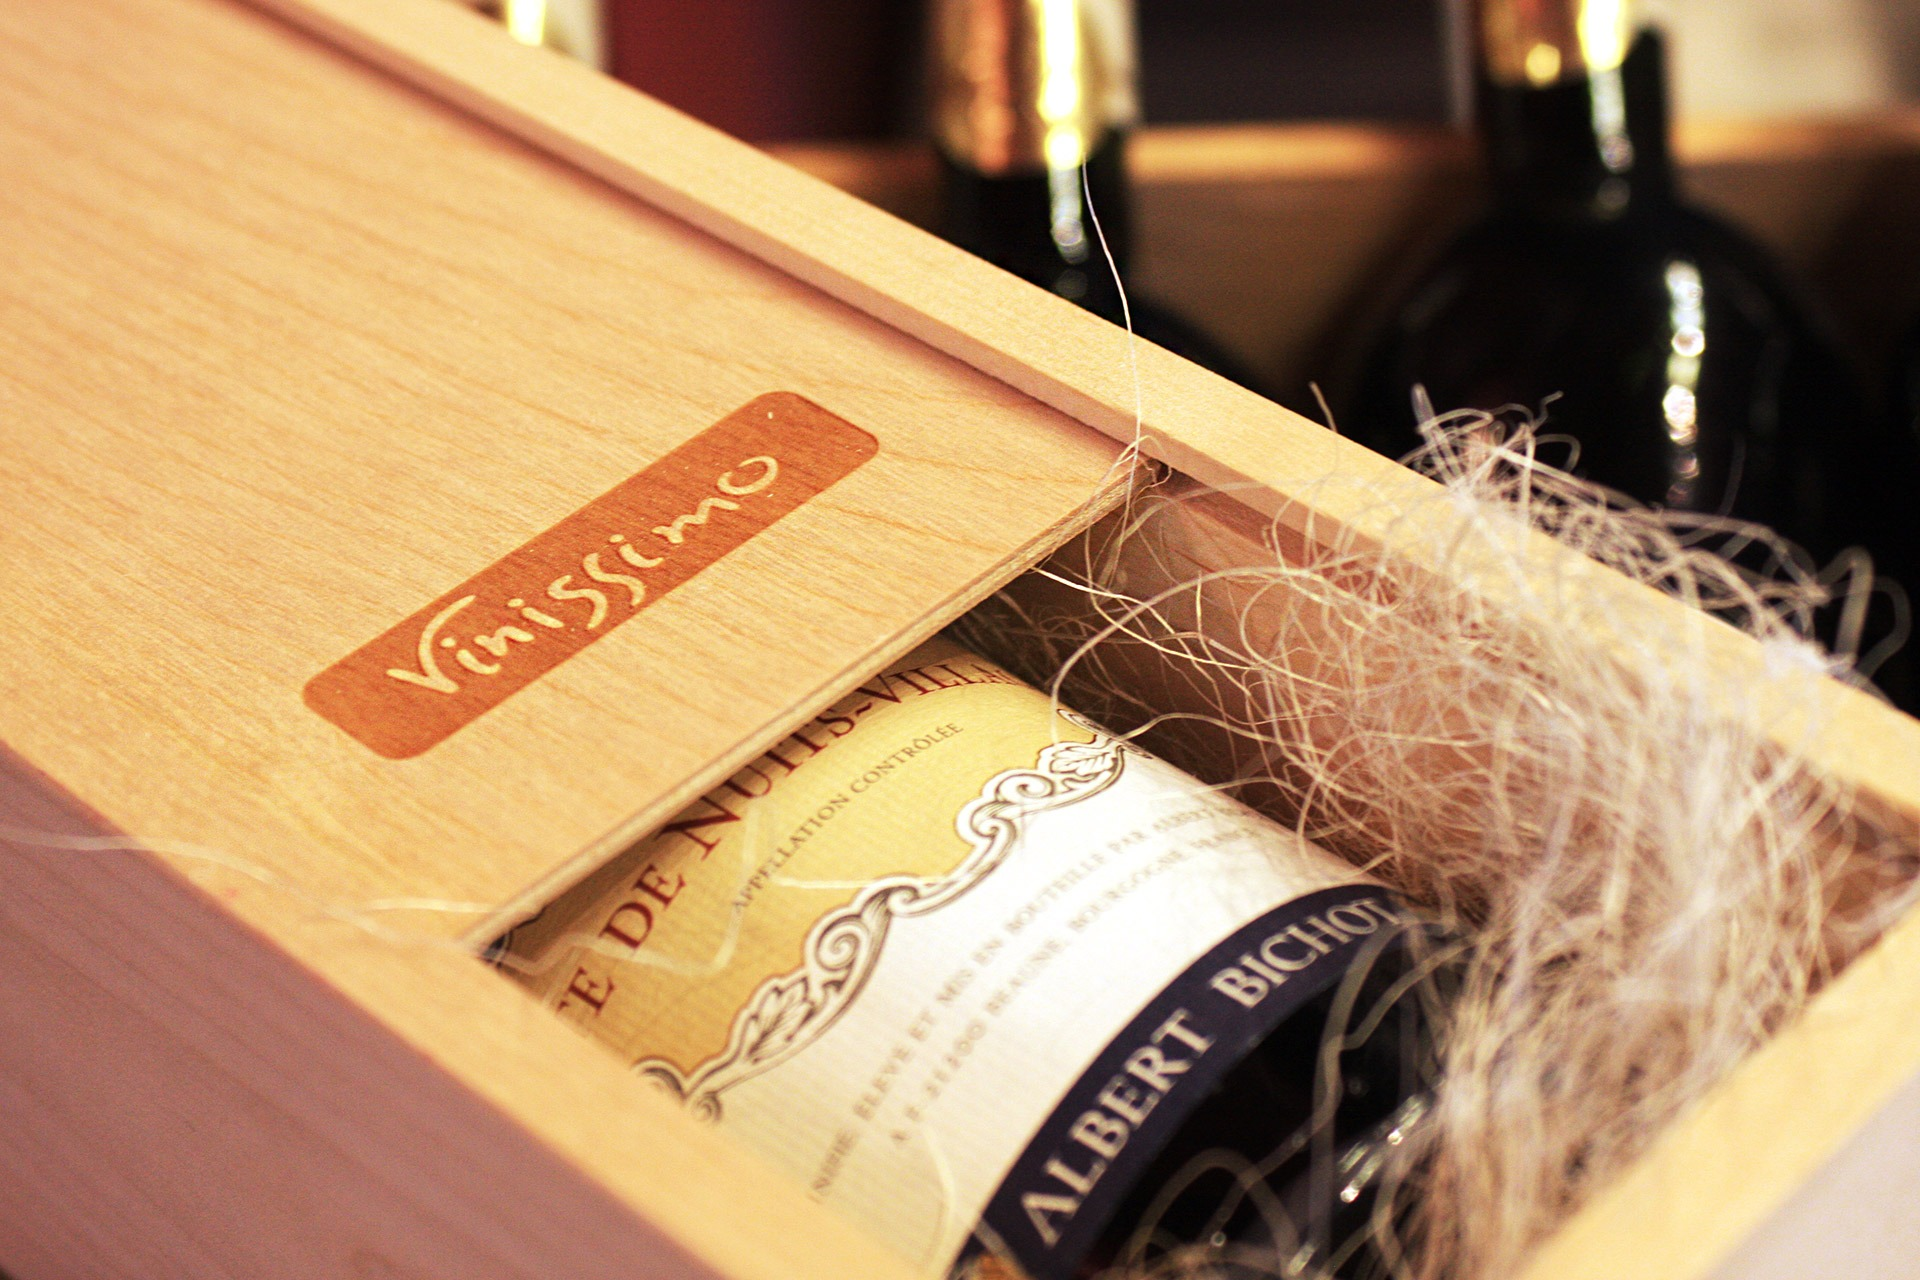 Асгард Брендинг, фирменный стиль, айдентика, лого, винный бутик, дизайн, графический дизайн, брендинг подарочной упаковки